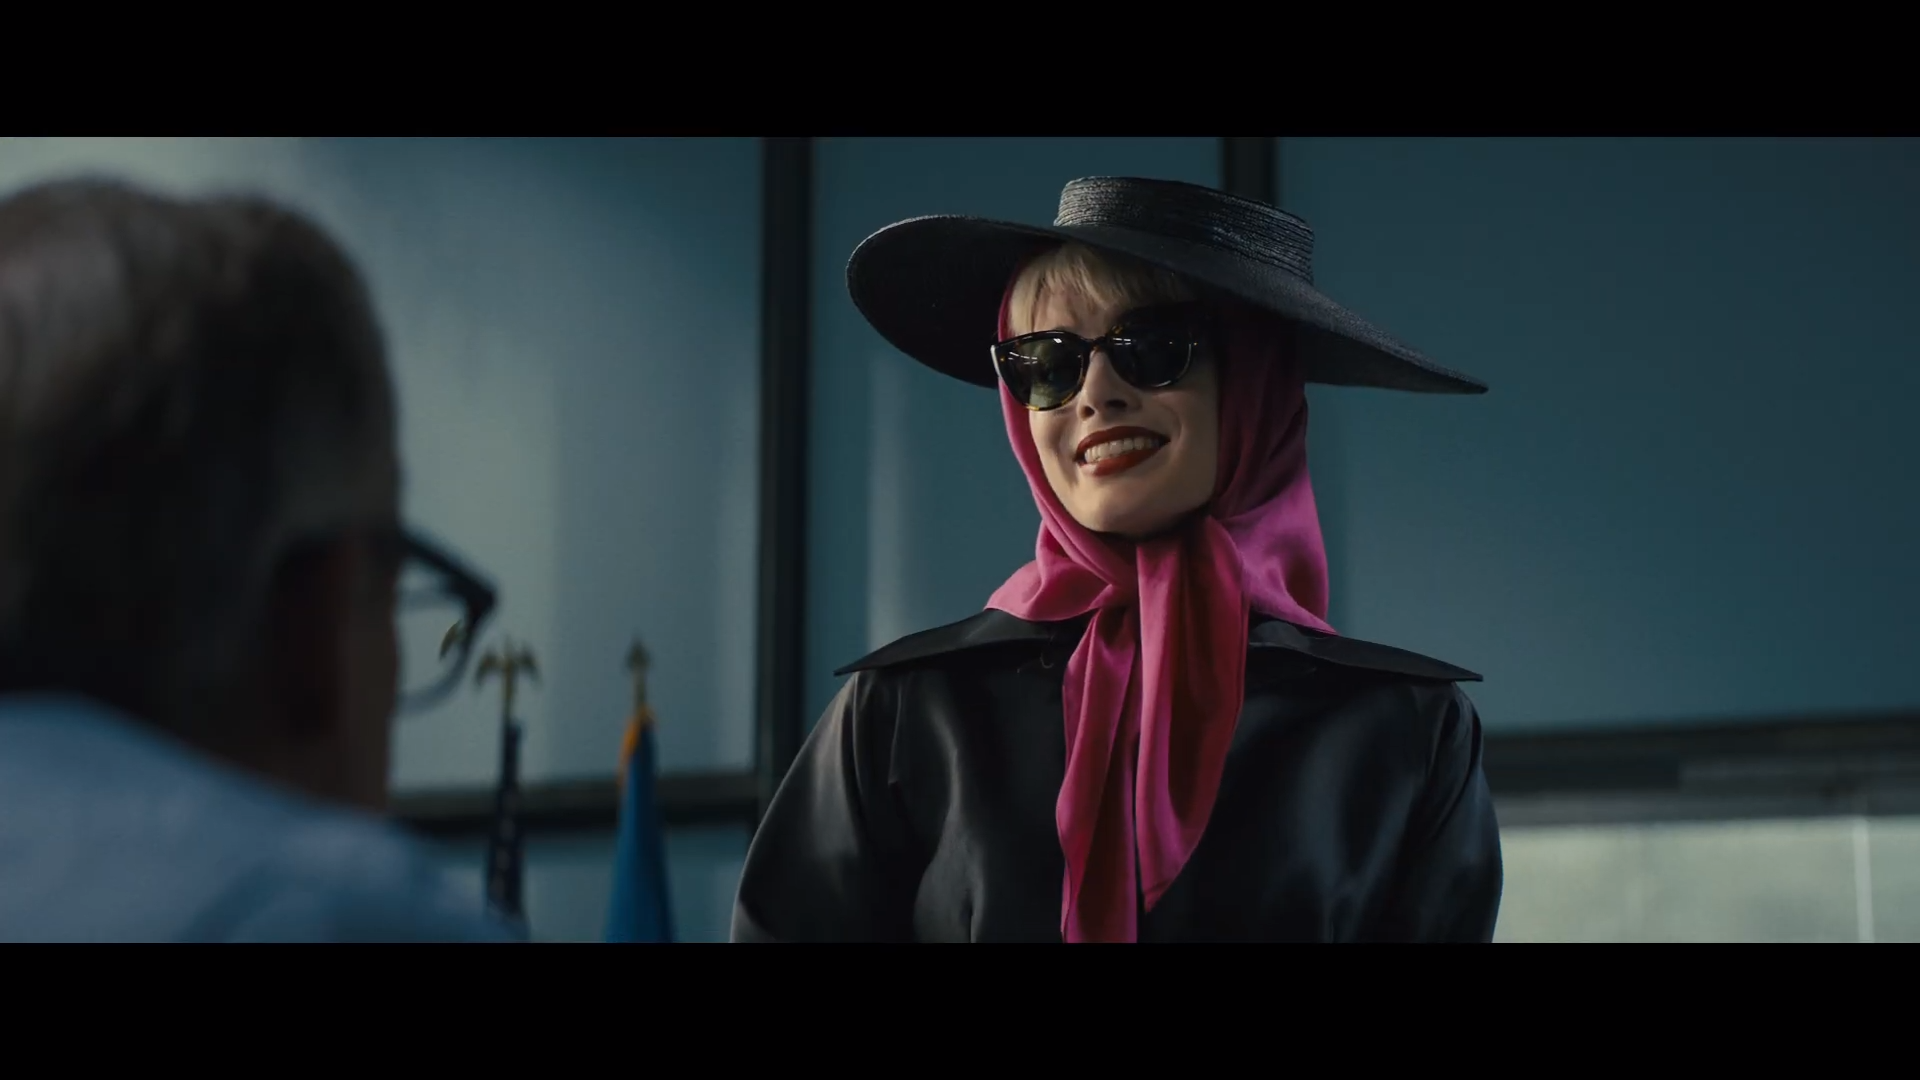 Birds Of Prey Star Margot Robbie Reveals Why She Chose That Movie Over Gotham City Sirens